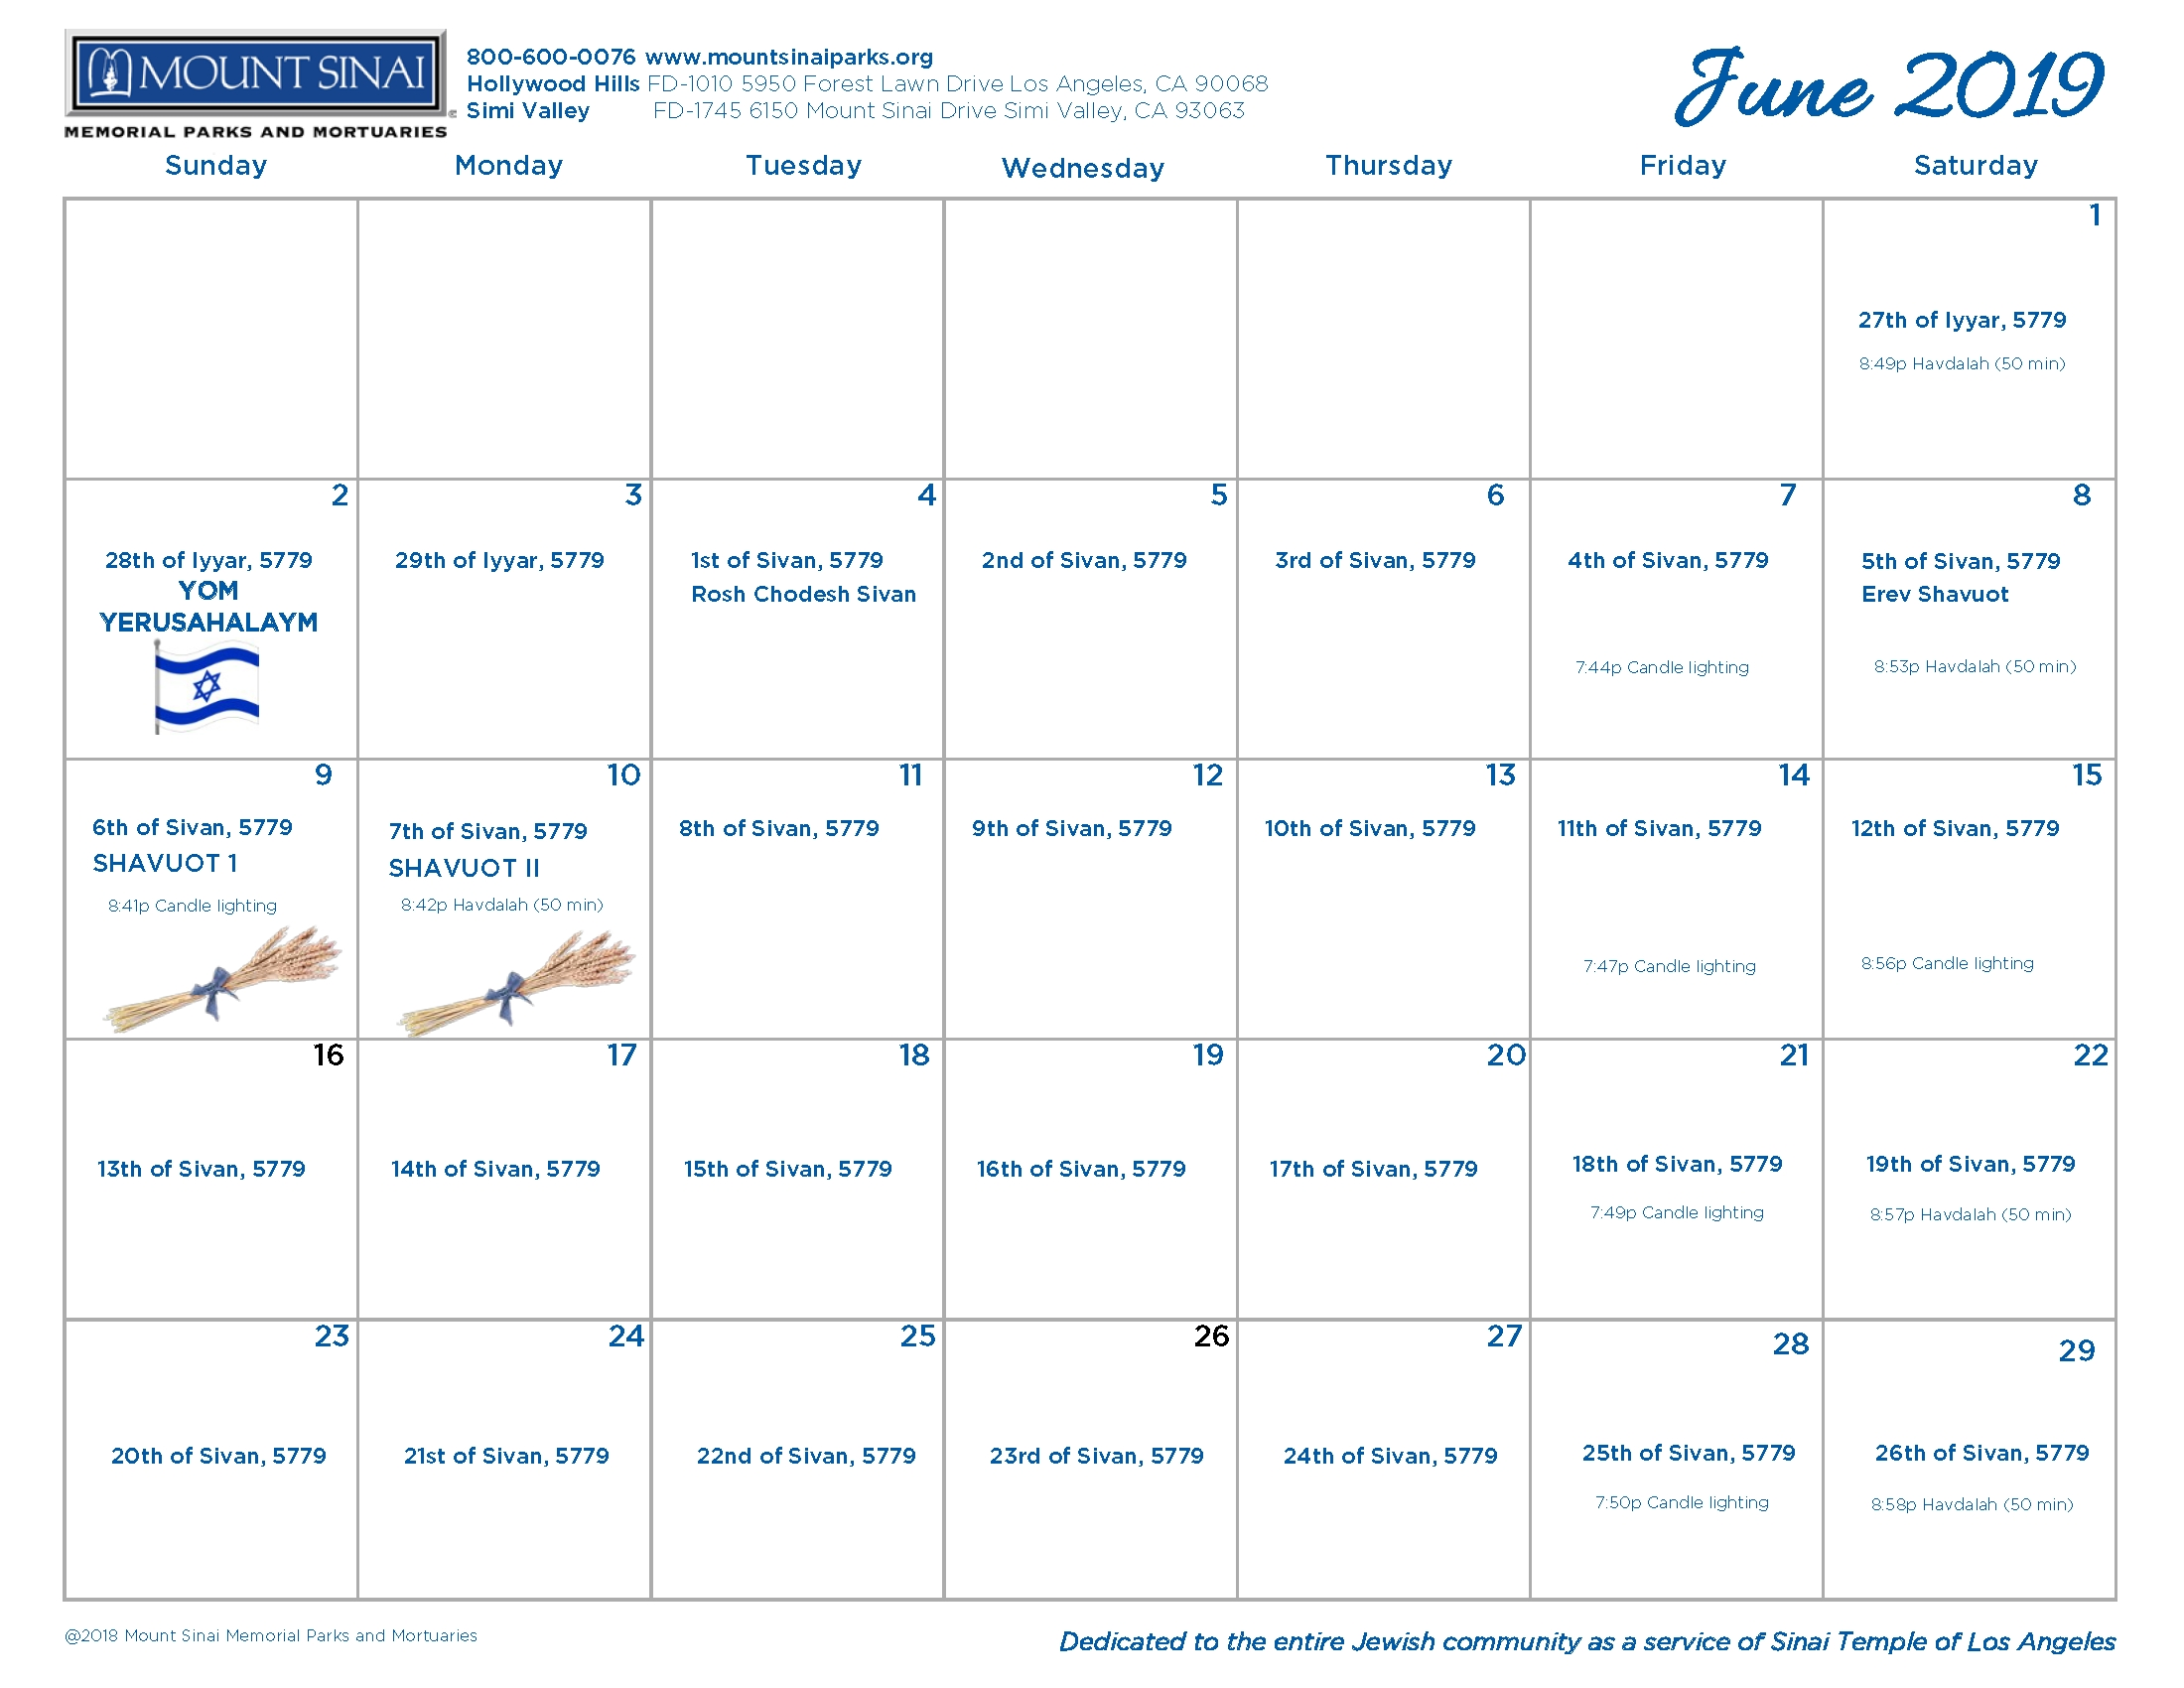 5779 Hebrew Calendar - Mount Sinai Memorial Parks And Mortuaries throughout Ewish Calendar 2019 - 2020